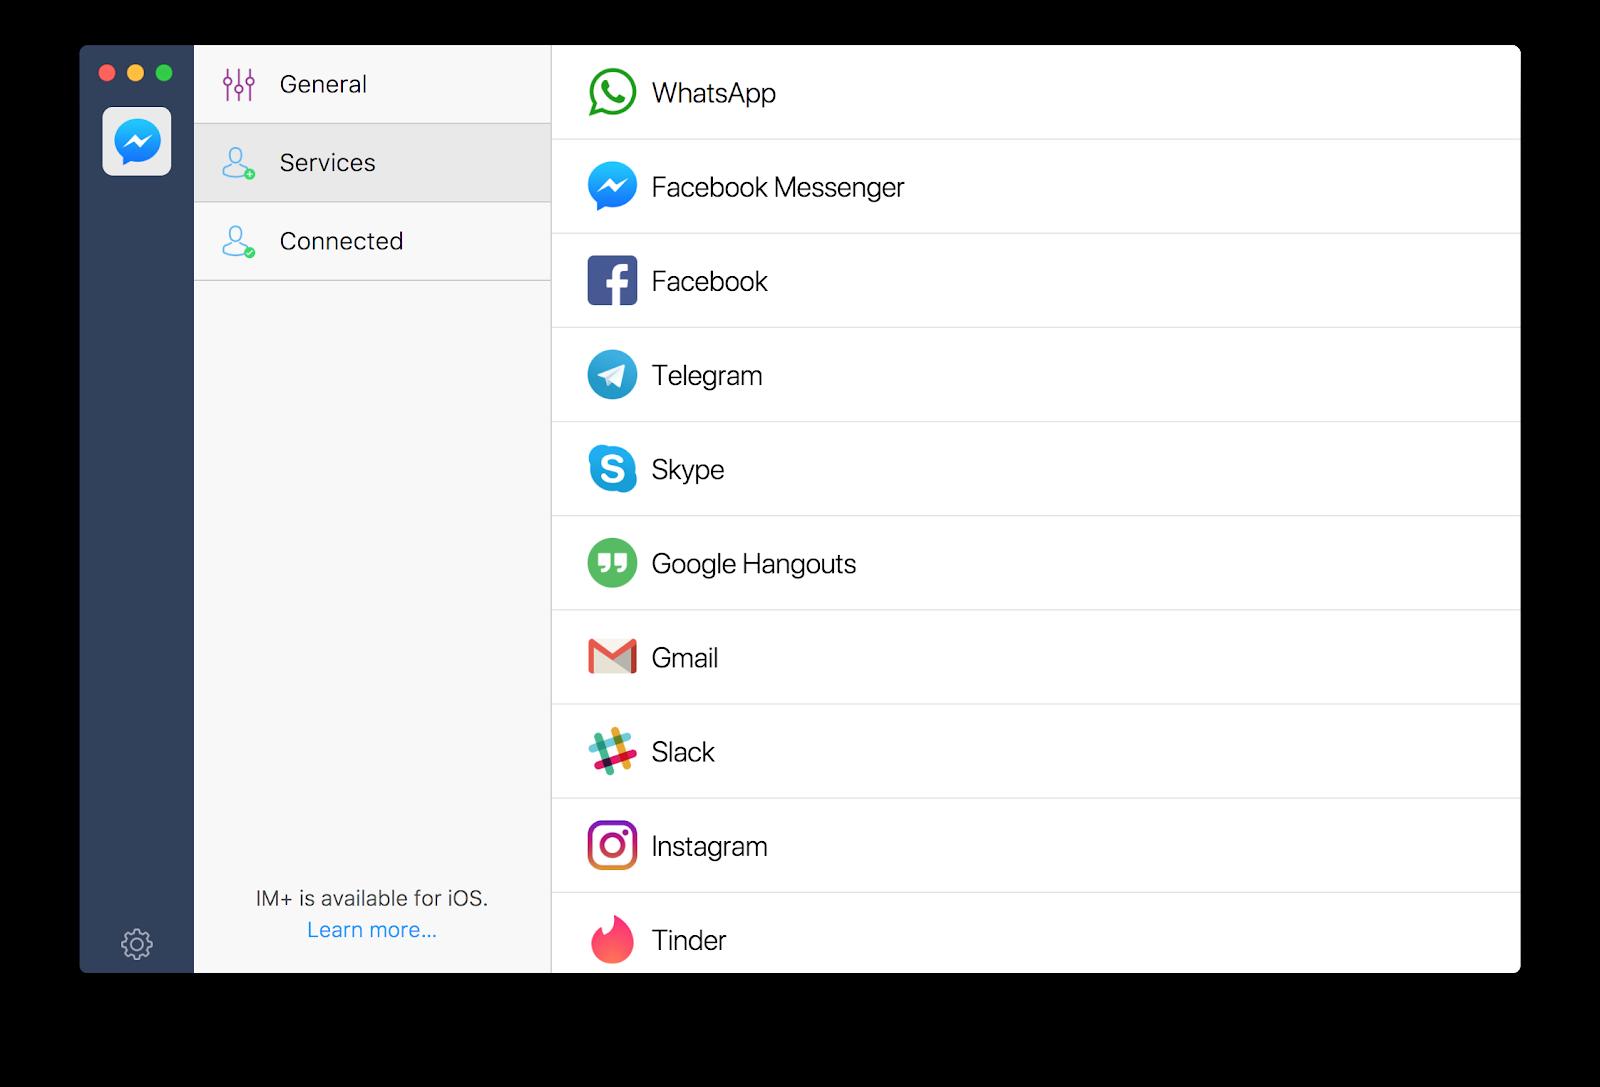 IM+ messaging client